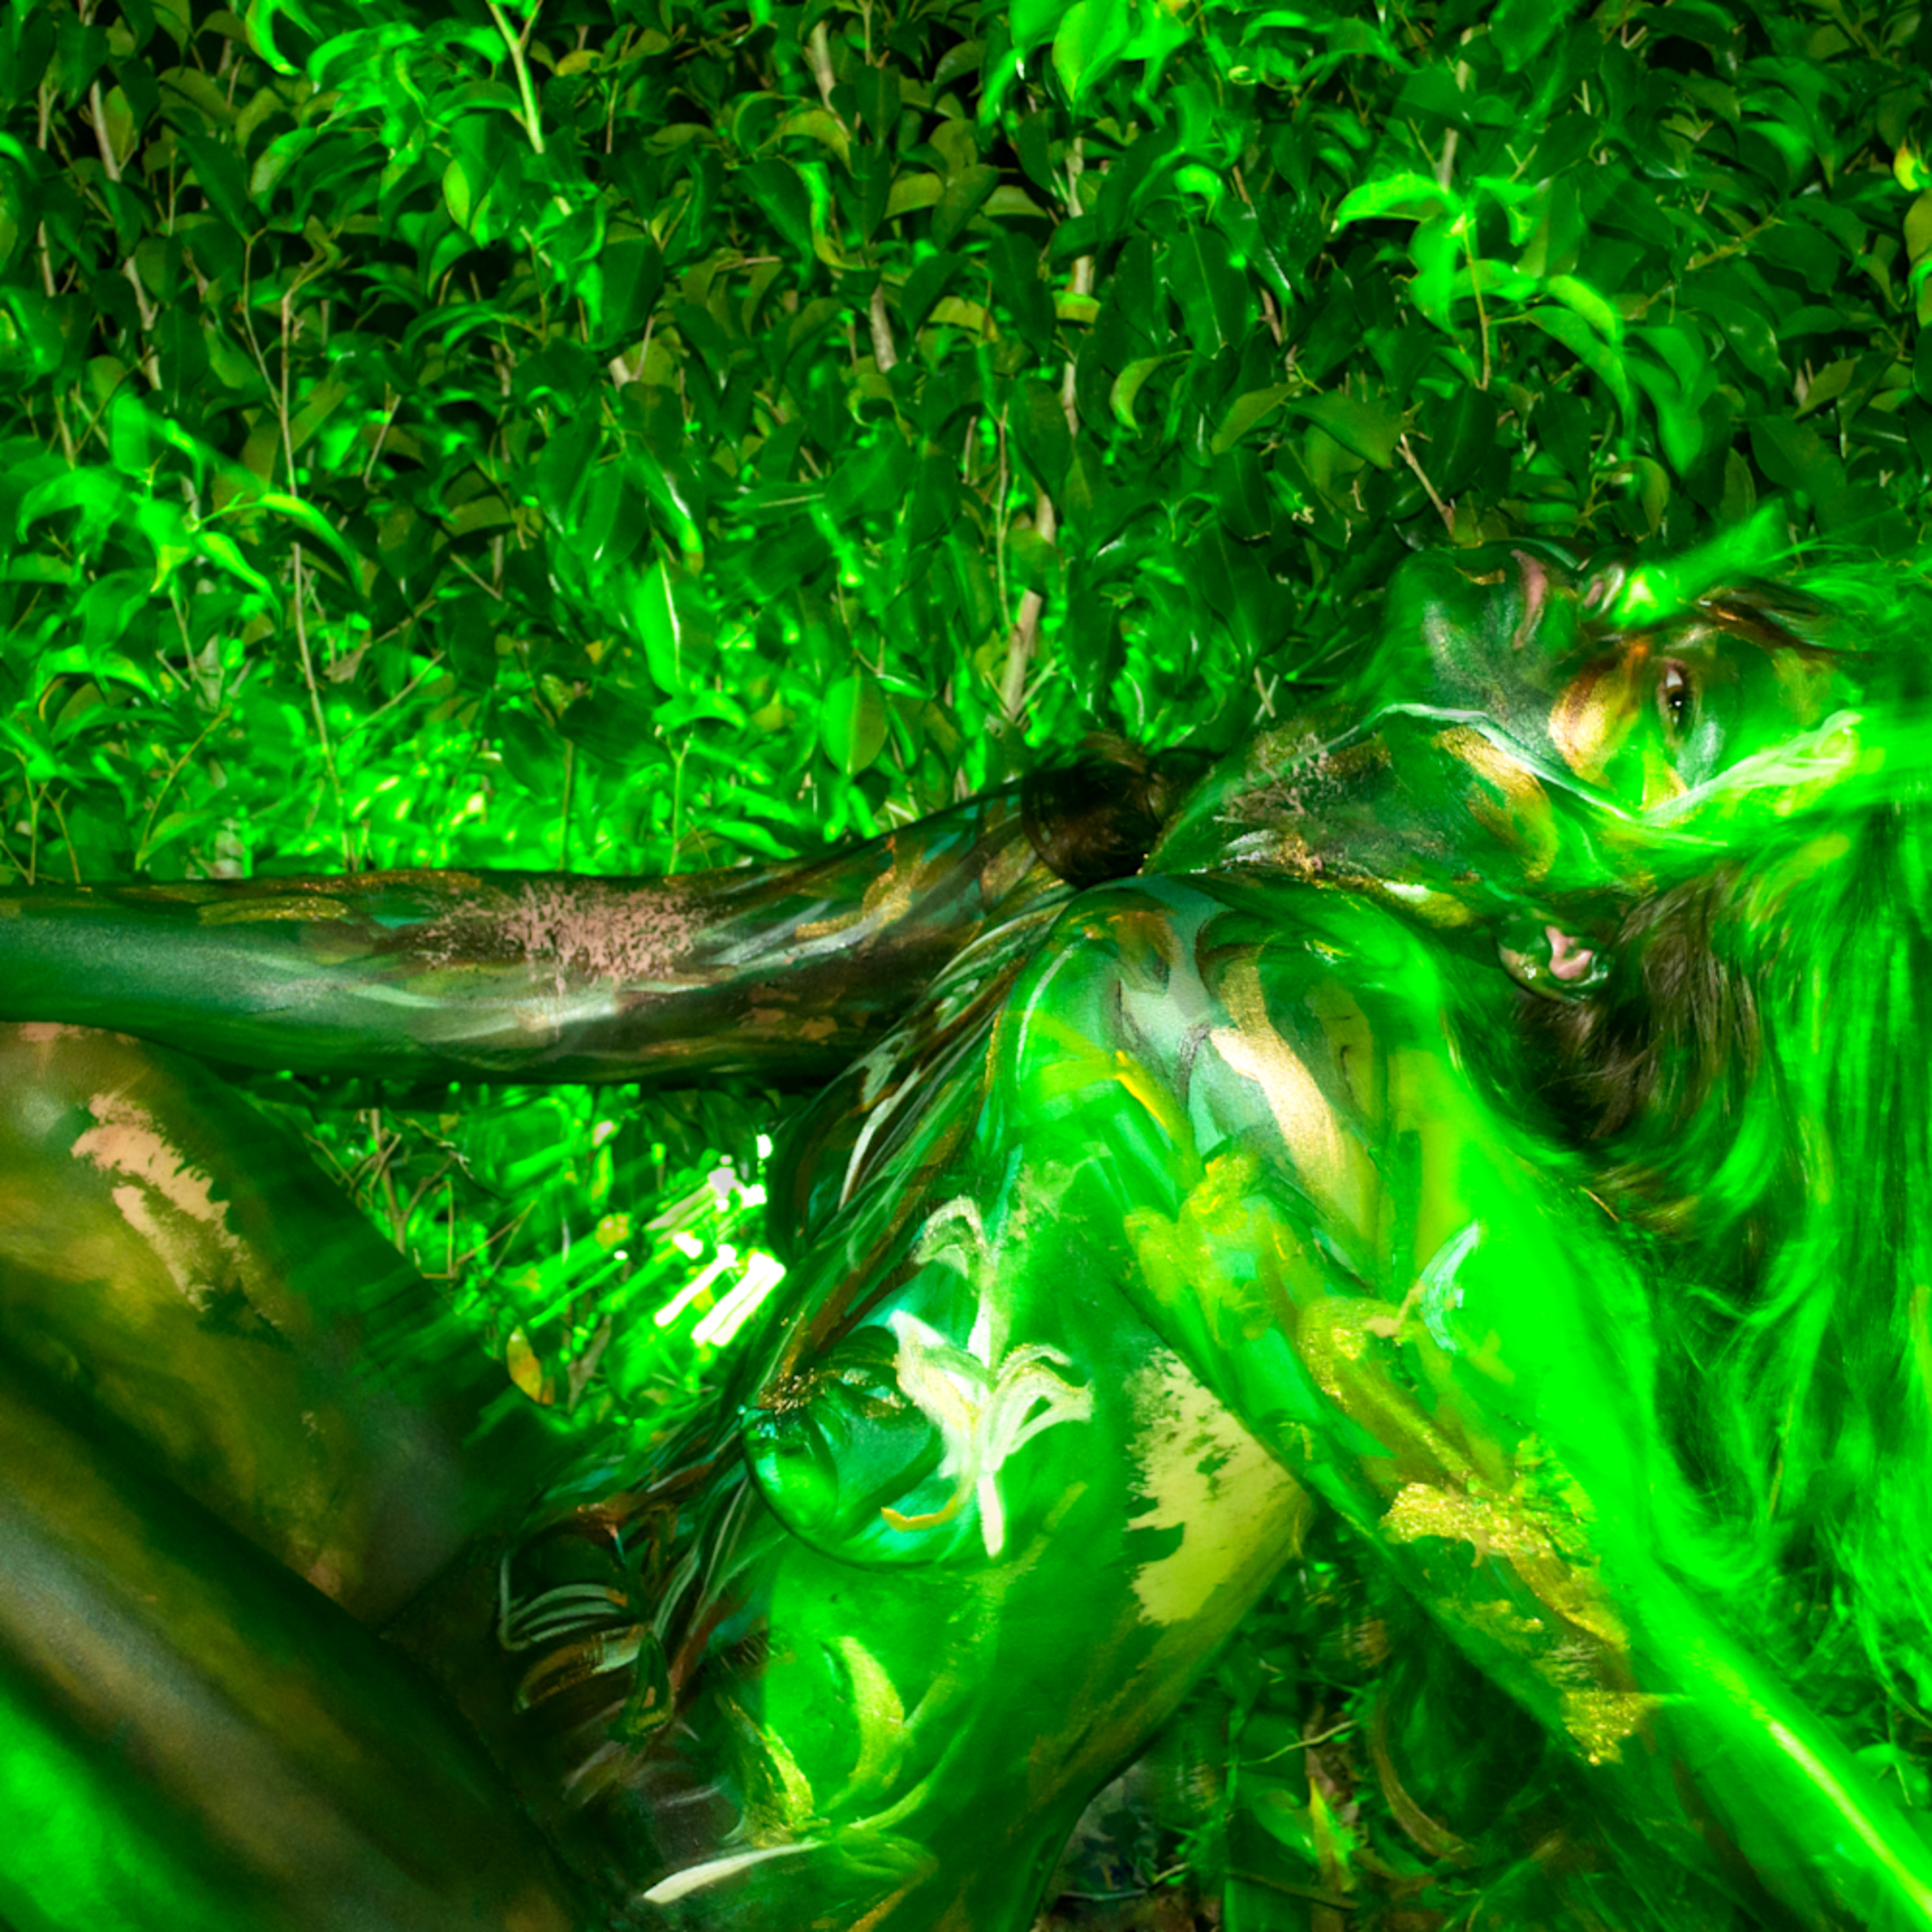 2012 cafeina.greens florida ipftxd